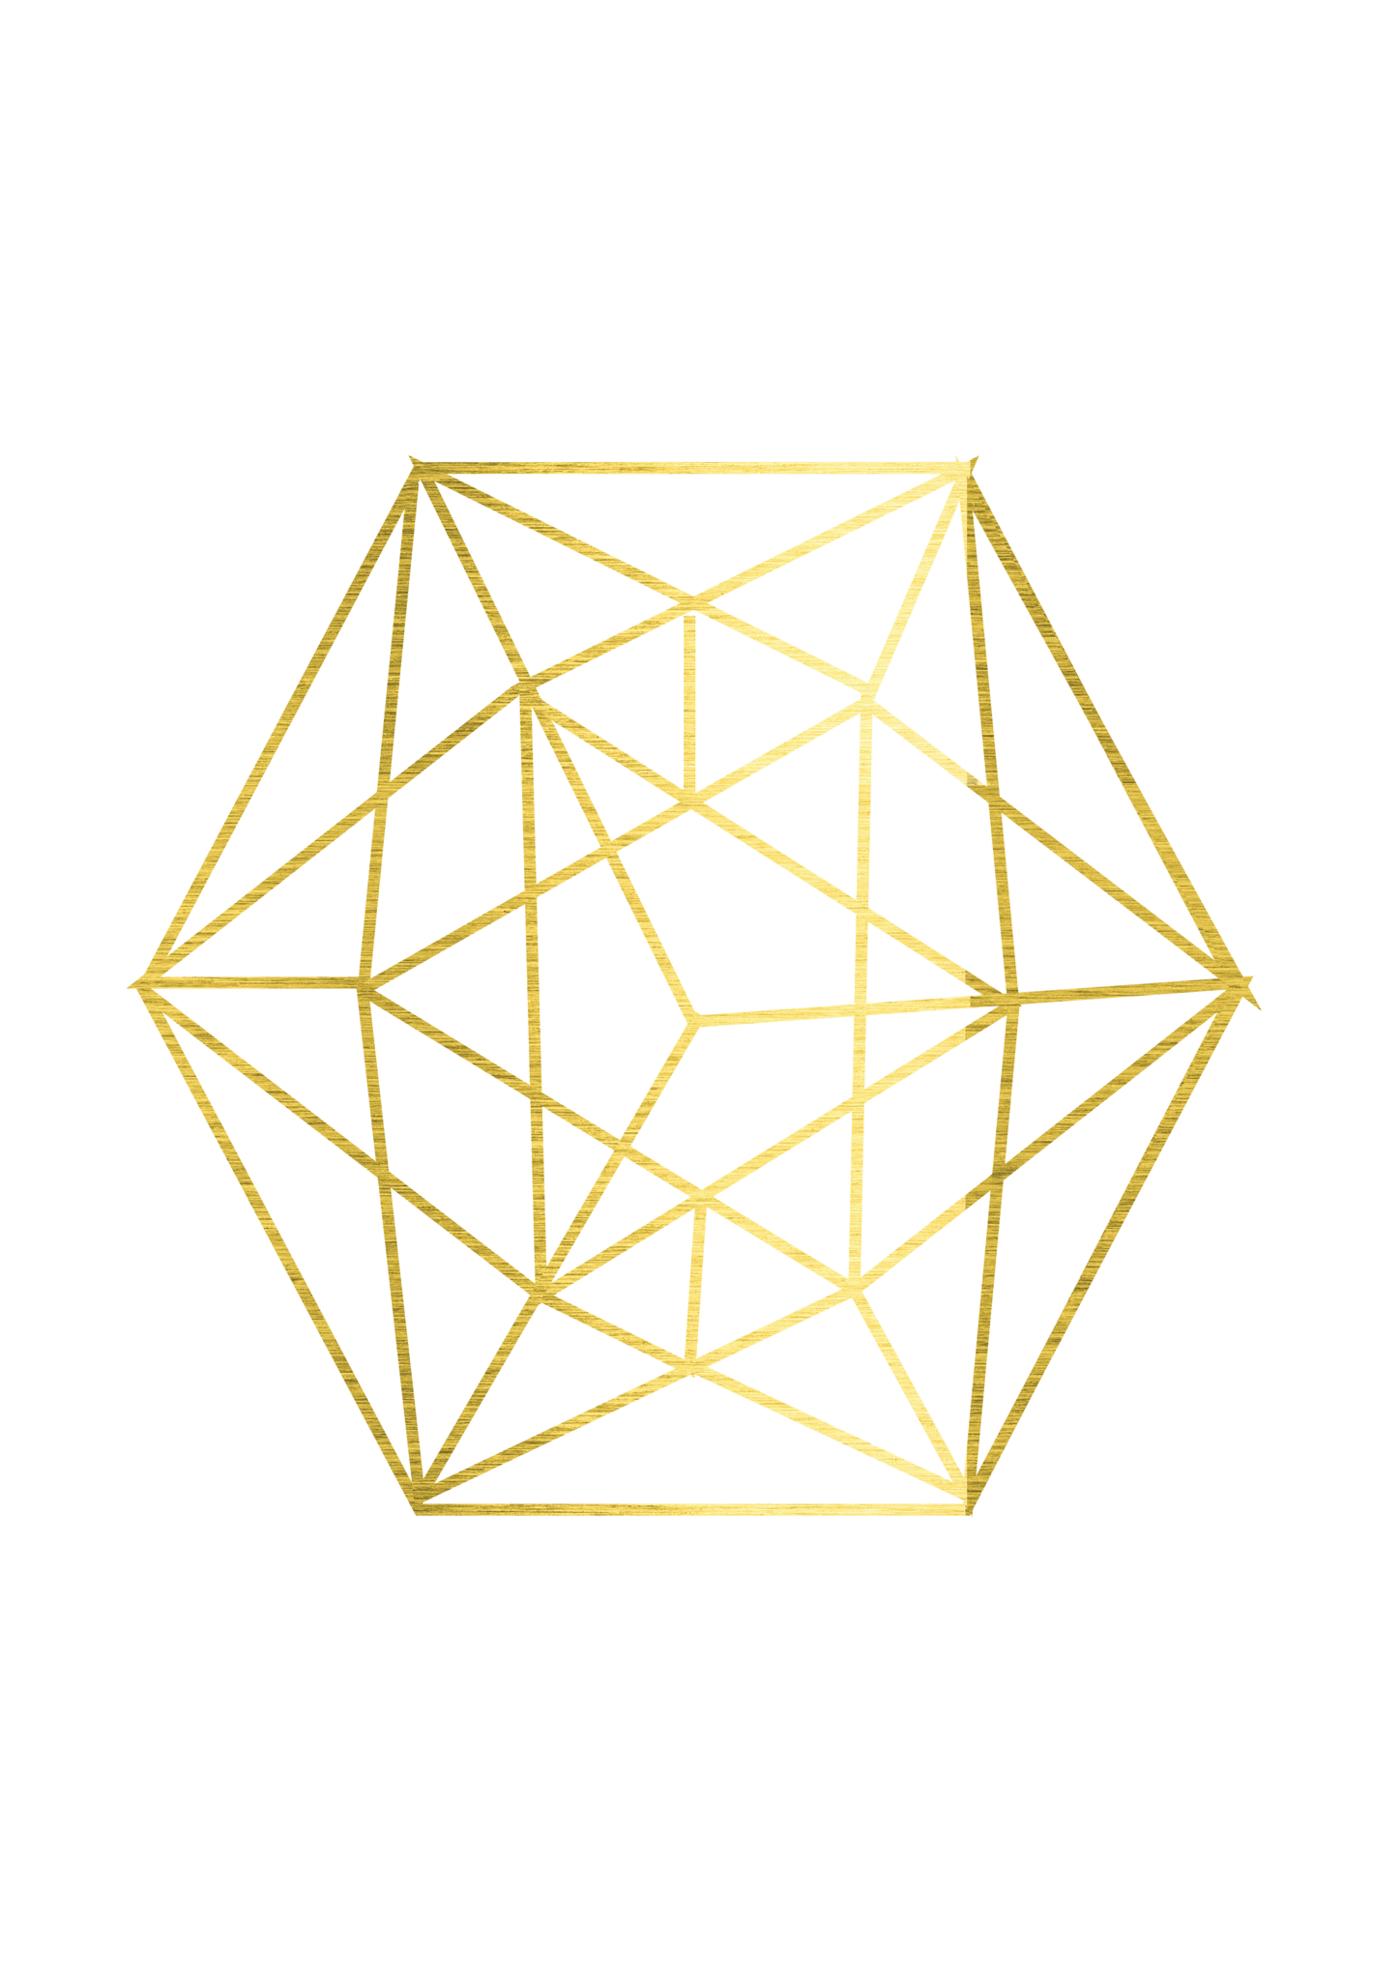 Pin By Elizabeth Gonzalez On Invitation Background Geometric Shapes Gold Shapes Geometric